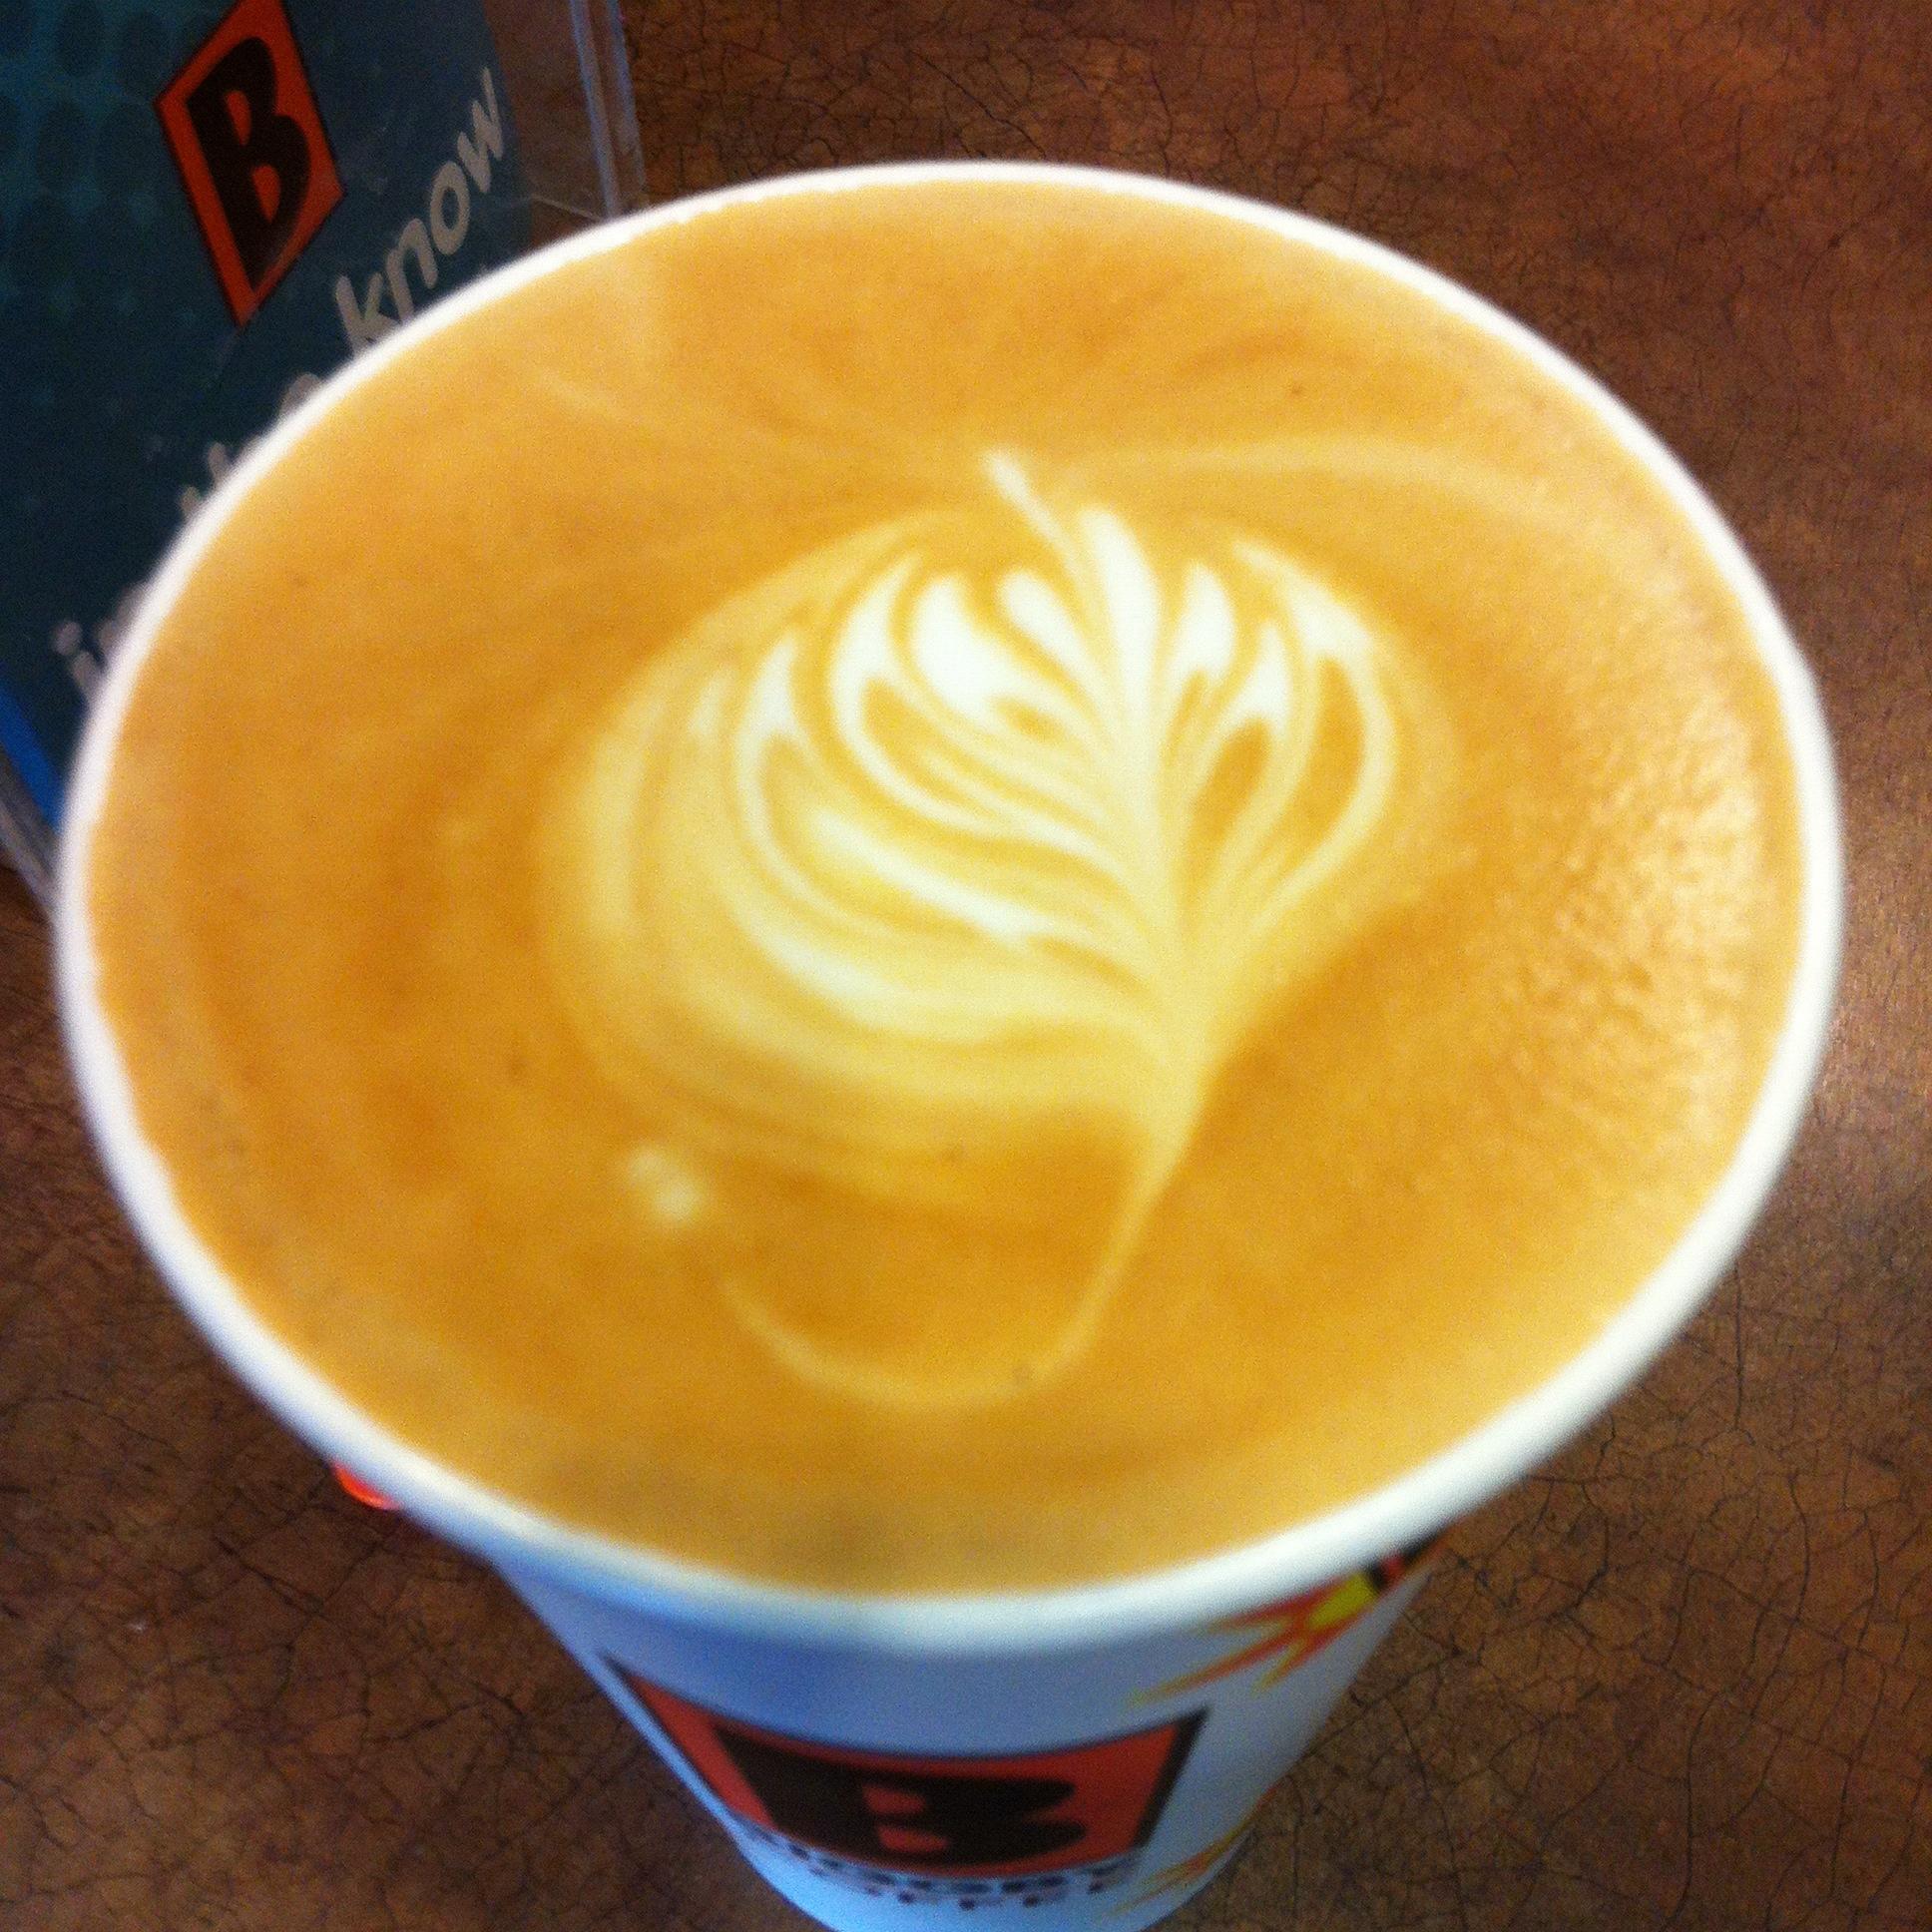 Thursday 08-23-12 Coffee Haiku: